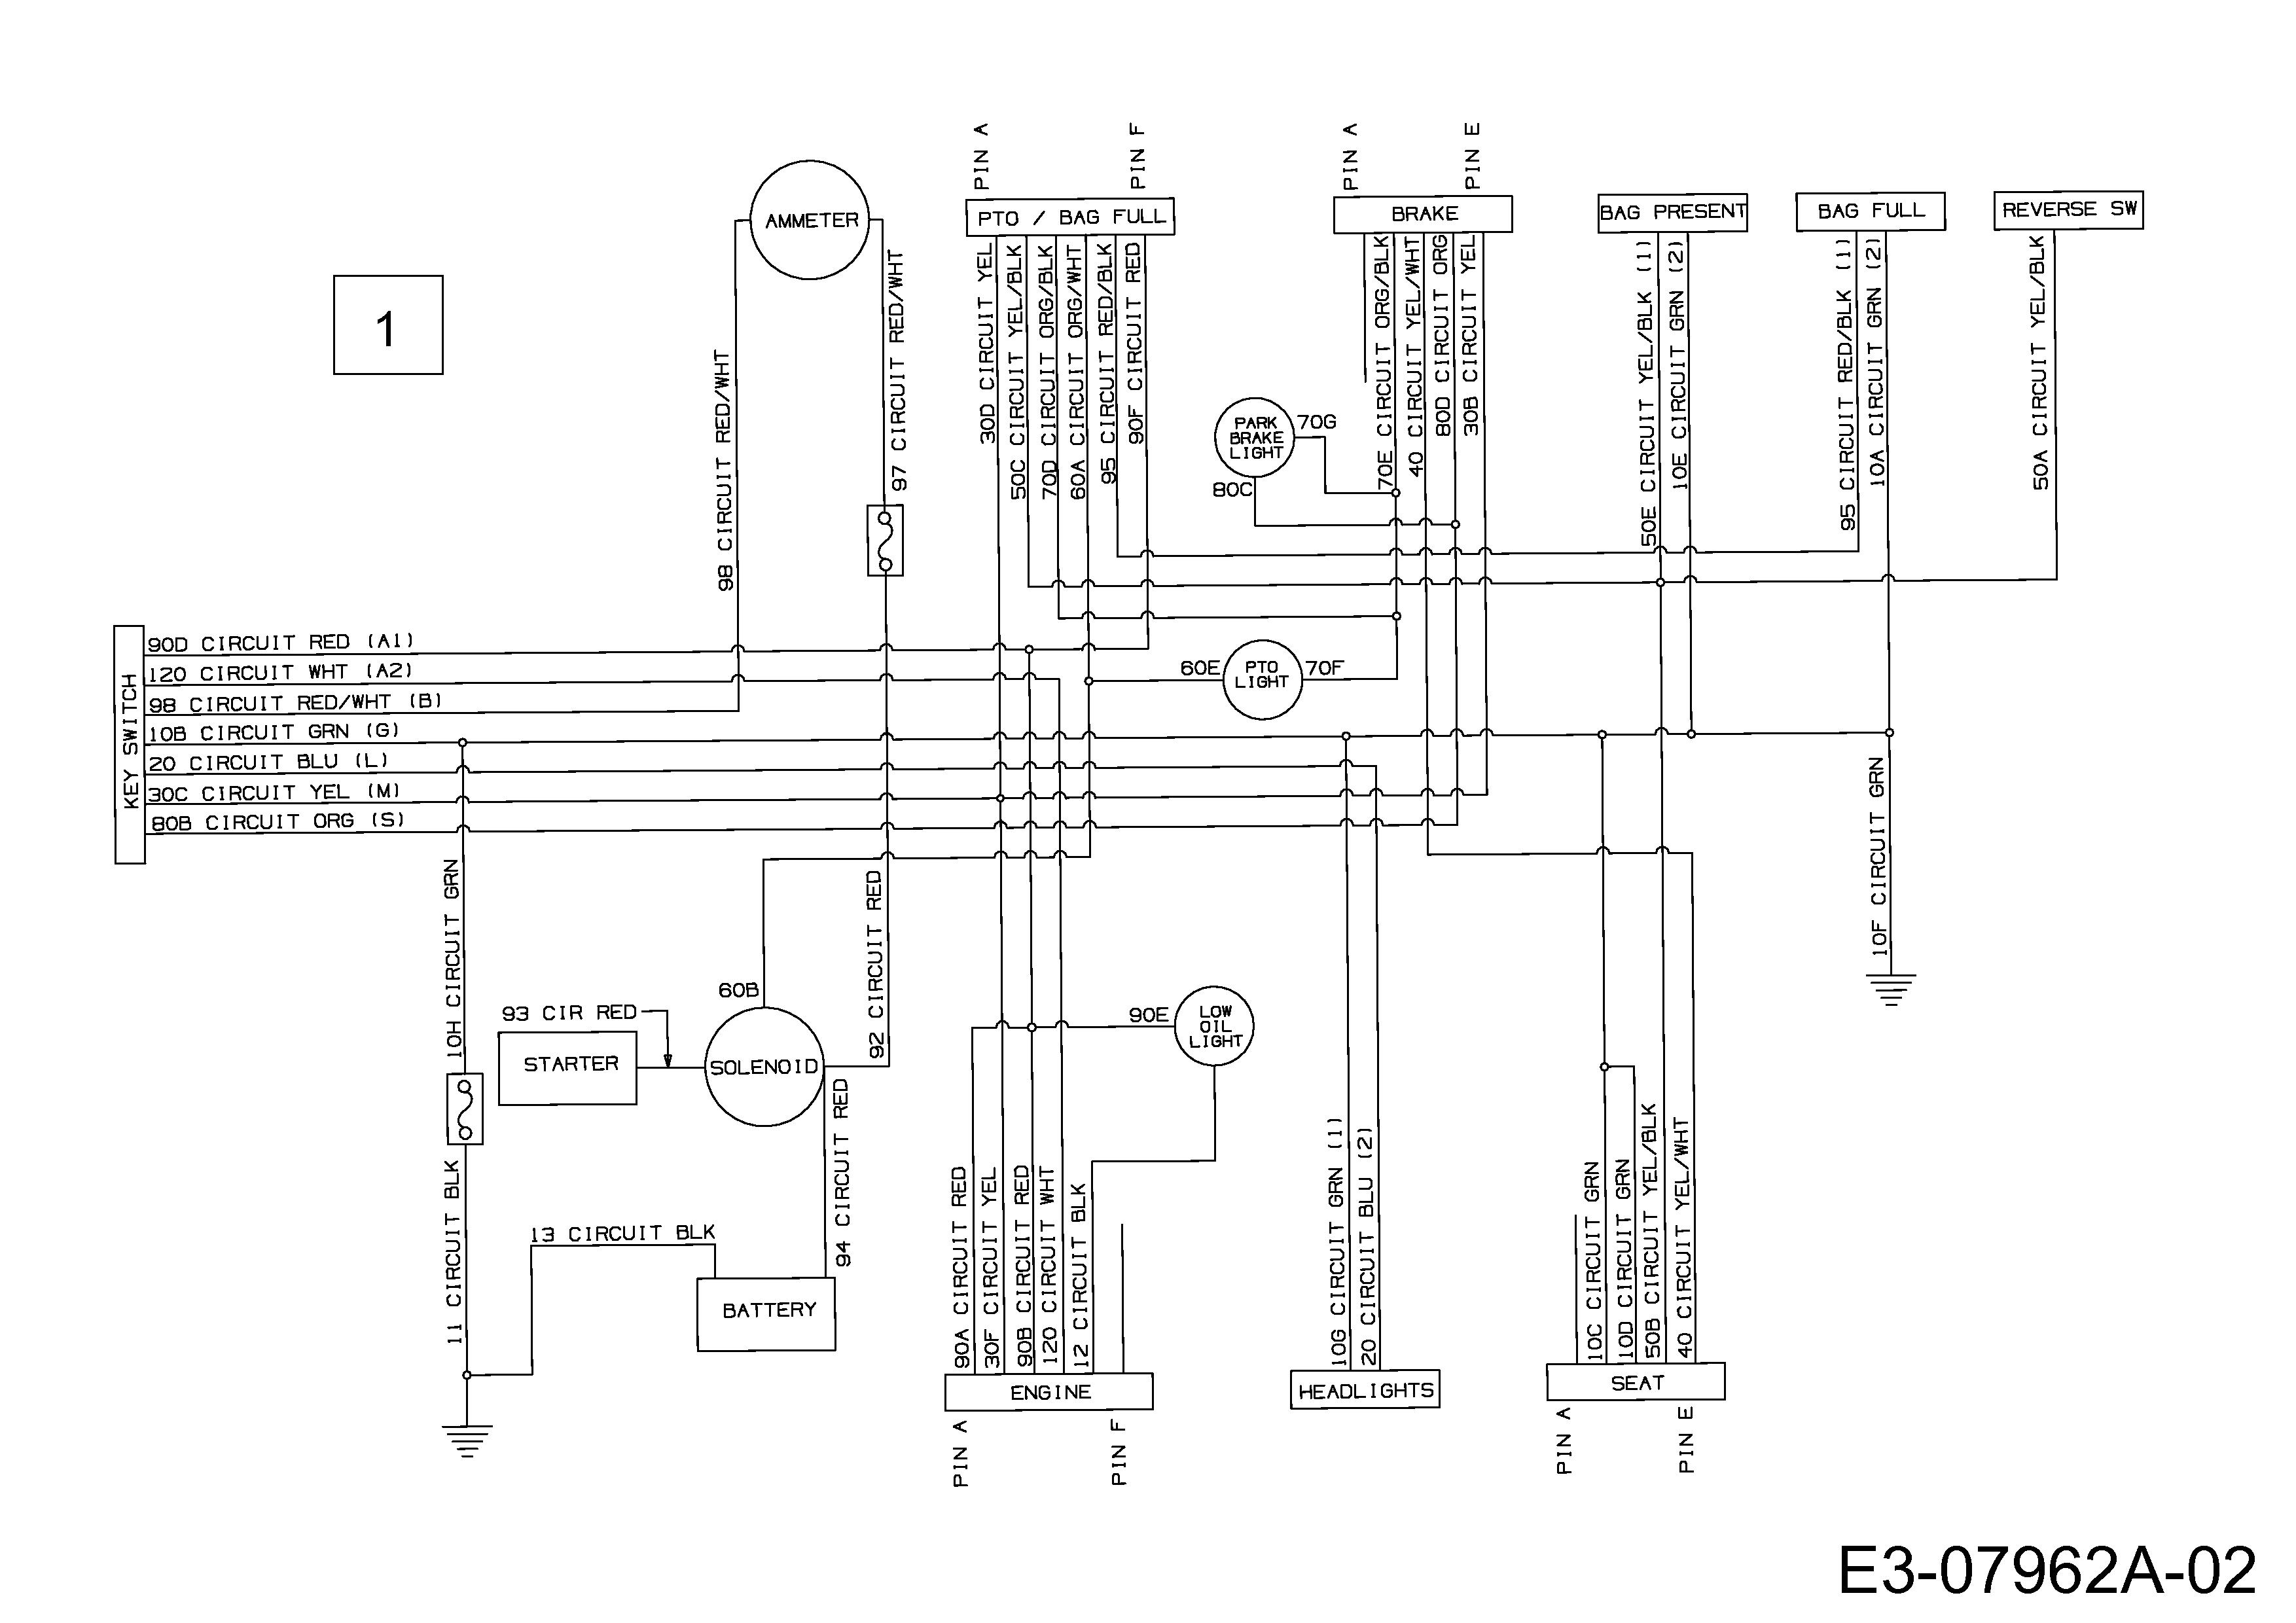 Gutbrod GLX 92 RAL Schaltplan 13AE506E690 (2002)